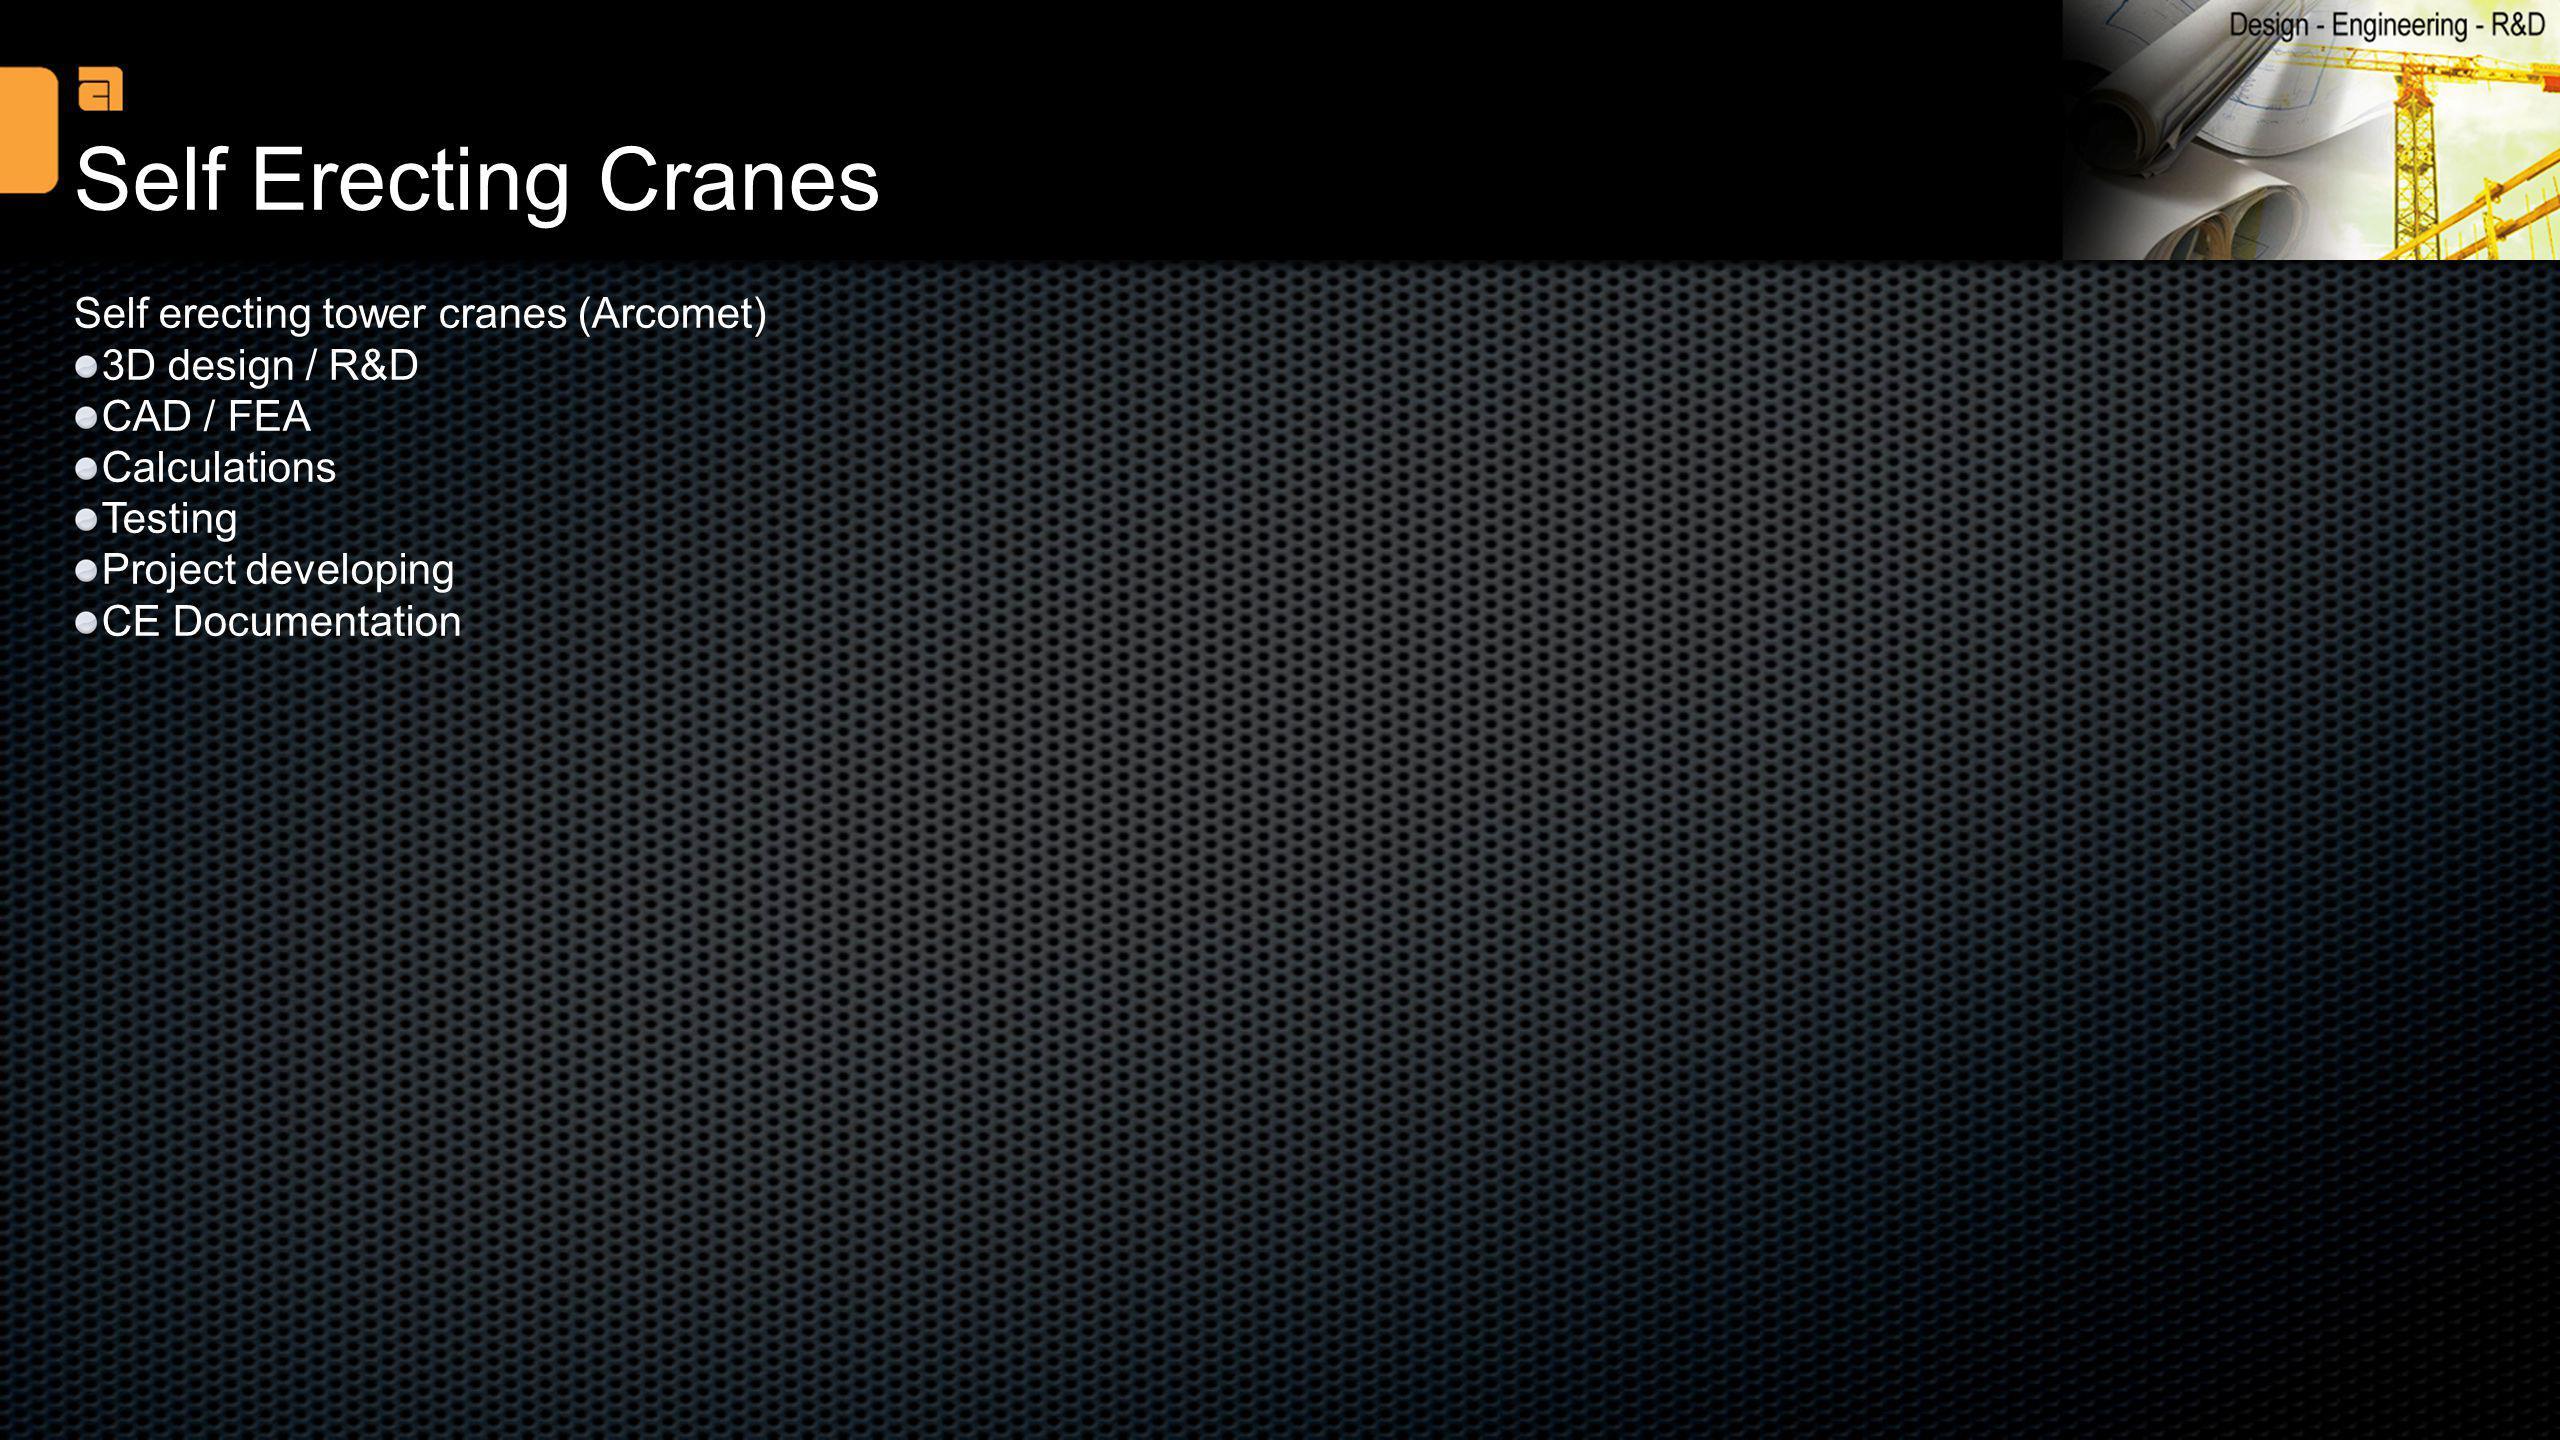 Self Erecting Cranes Self erecting tower cranes (Arcomet)